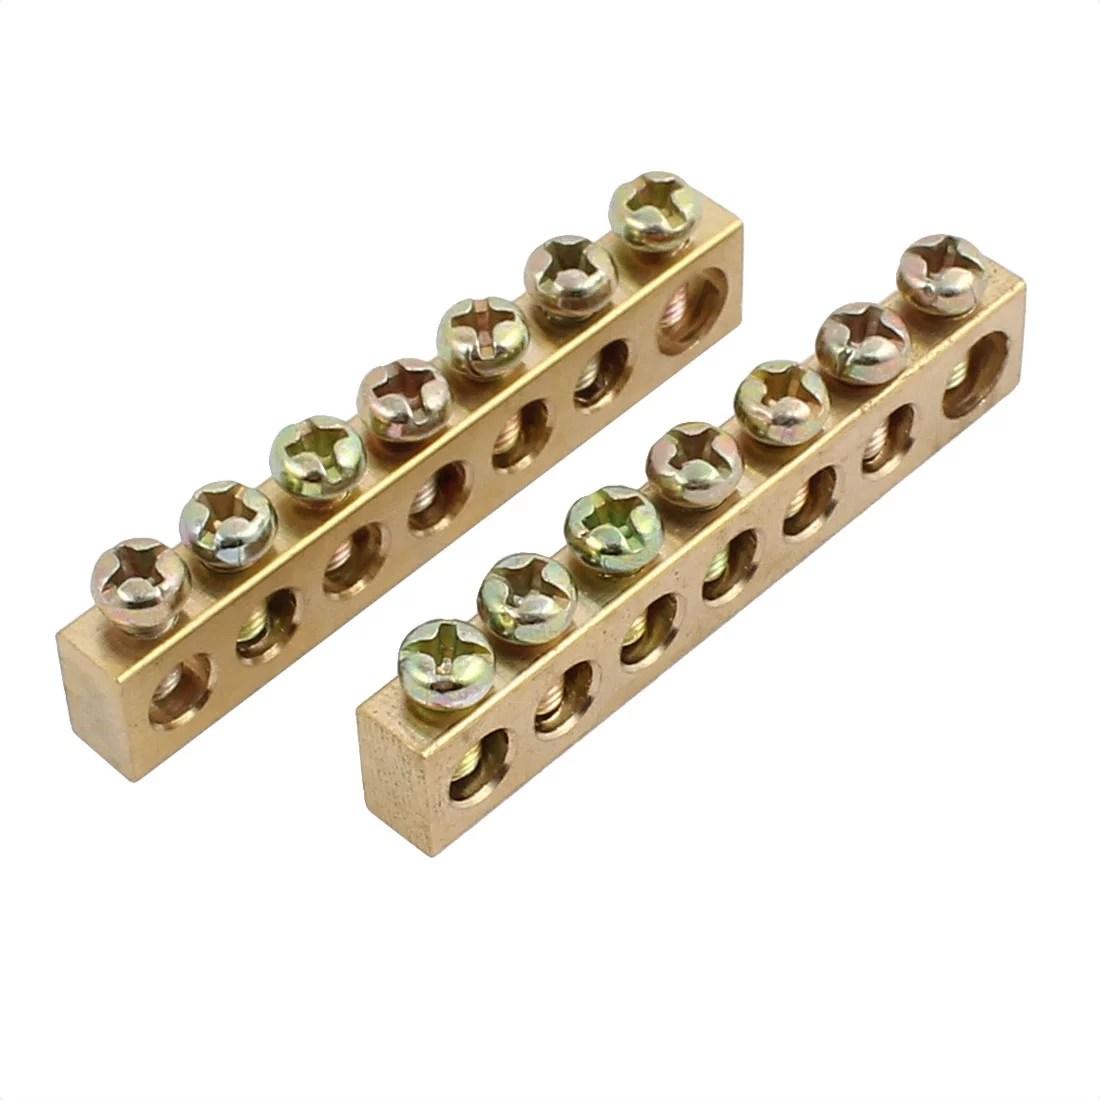 2pcs 6 10 wire connection screw terminal strip copper terminal 7 positions [ 1100 x 1100 Pixel ]